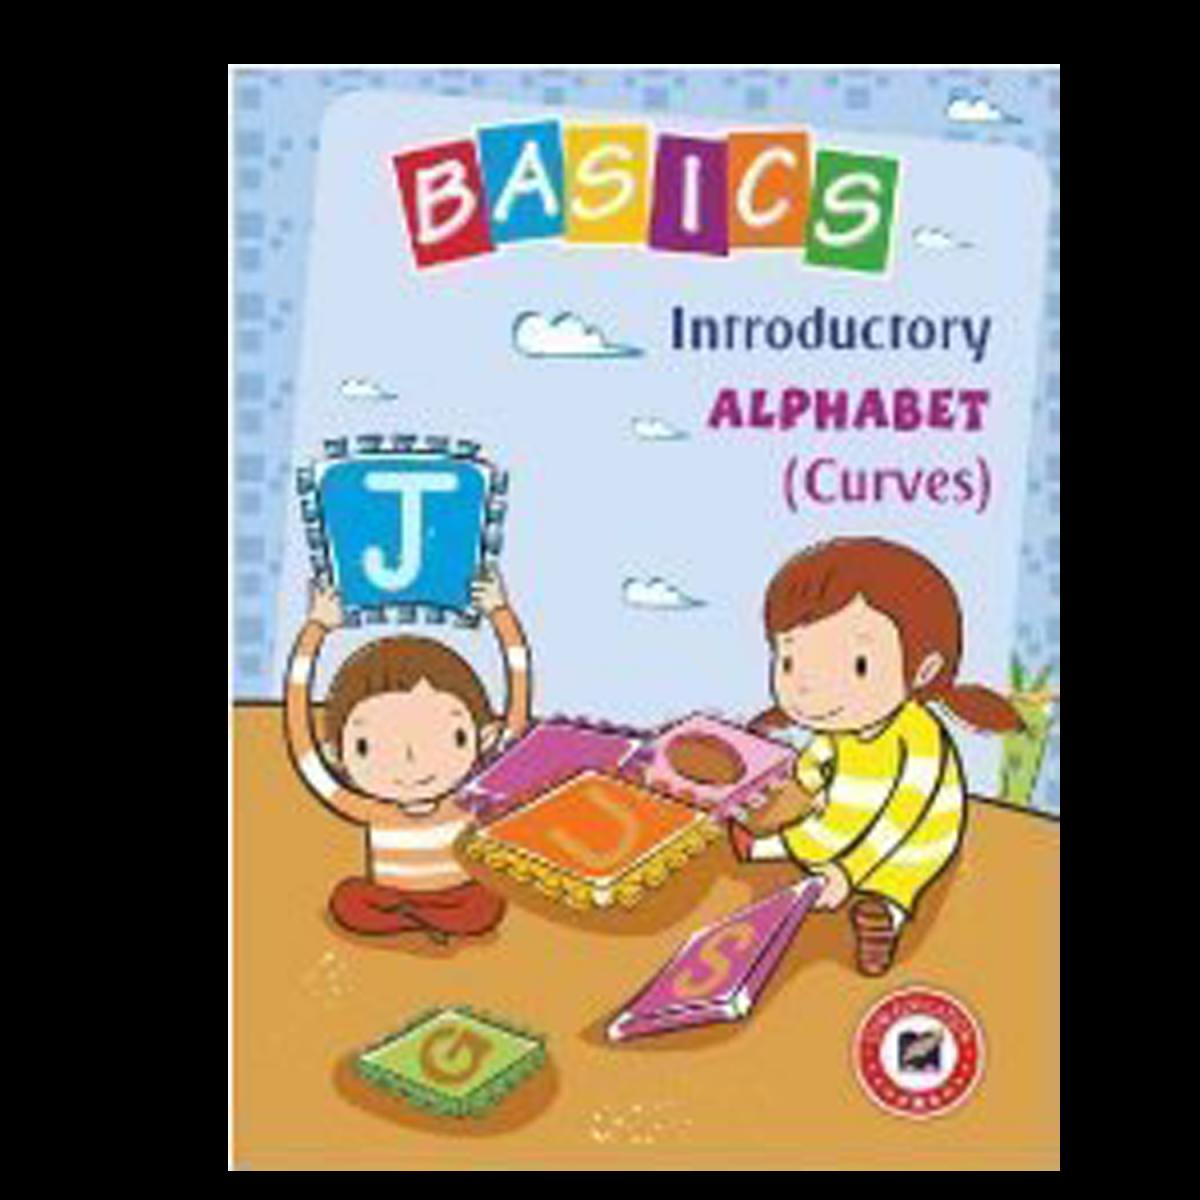 Basics Introductory Alphabet (Curves)